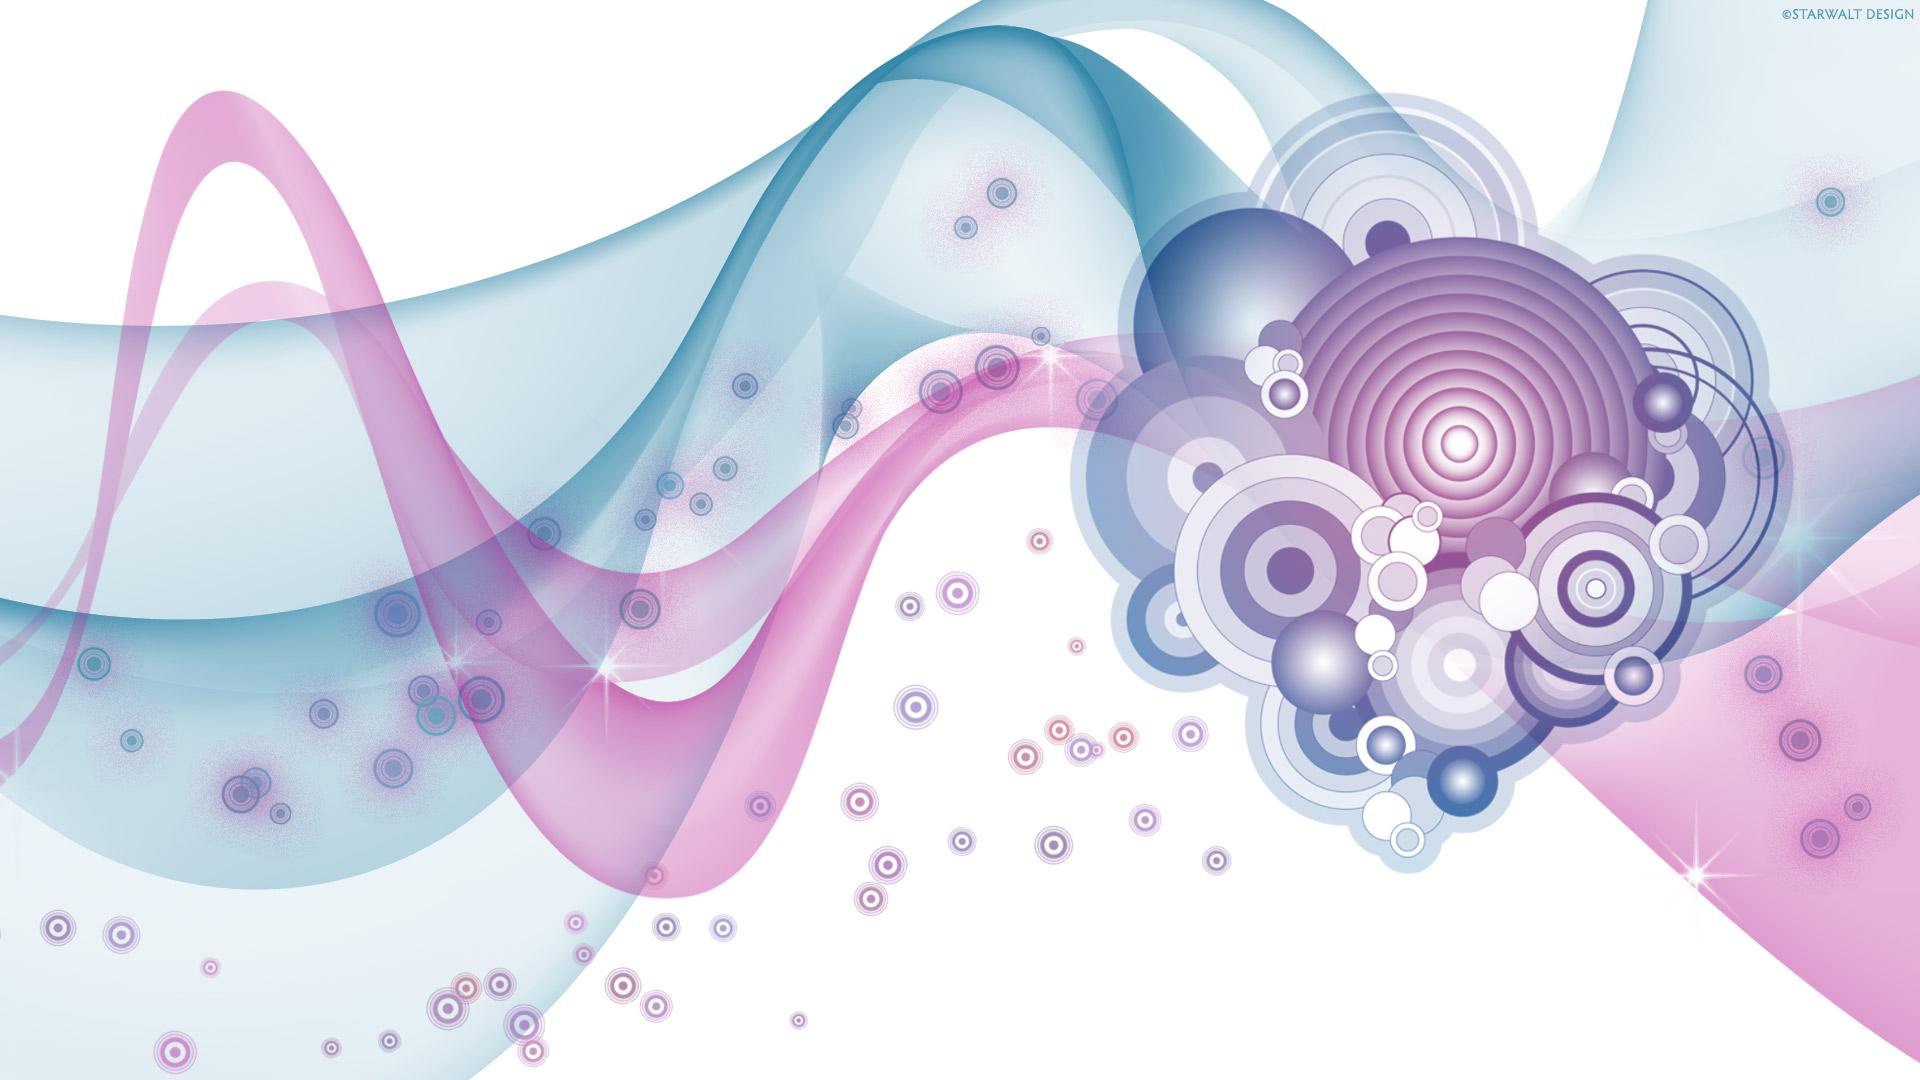 designs-vector-wallpaper-floral-design-images-wallpapers-array-wallwuzz-hd-wallpaper-8924